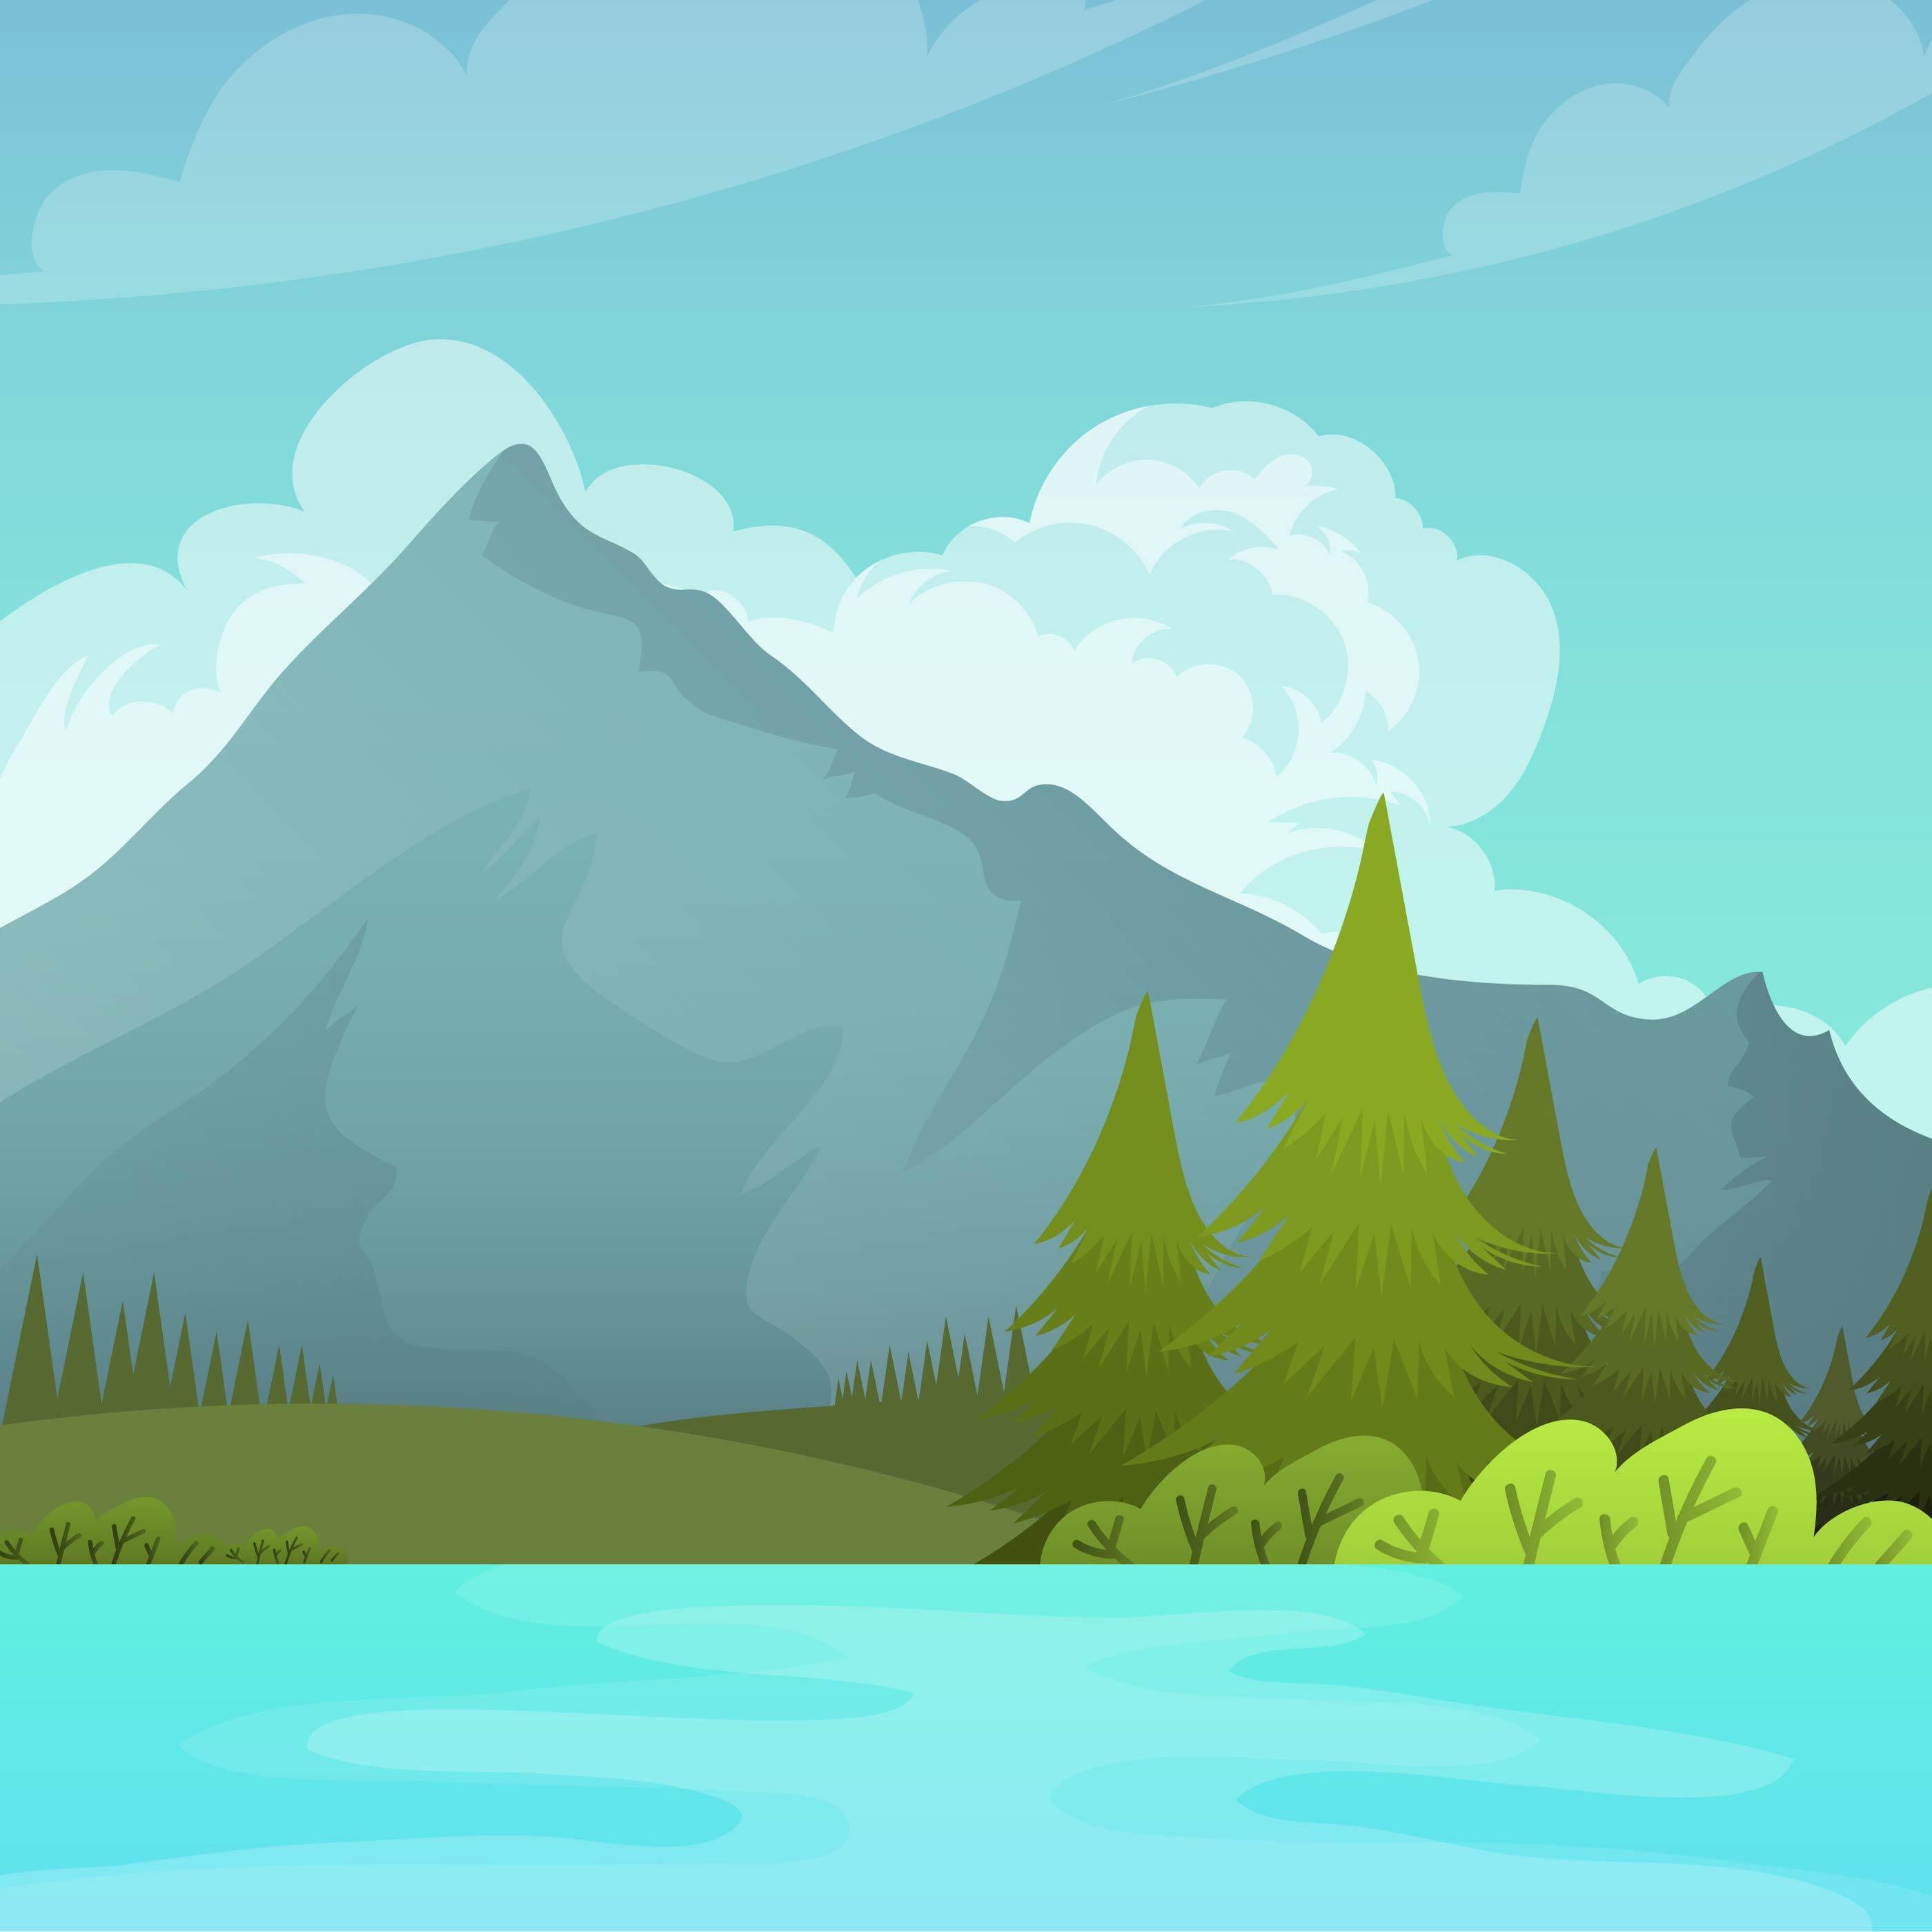 Landscape Illustration Vector Free: Flat Mountain Landscape With Lake Vector Background